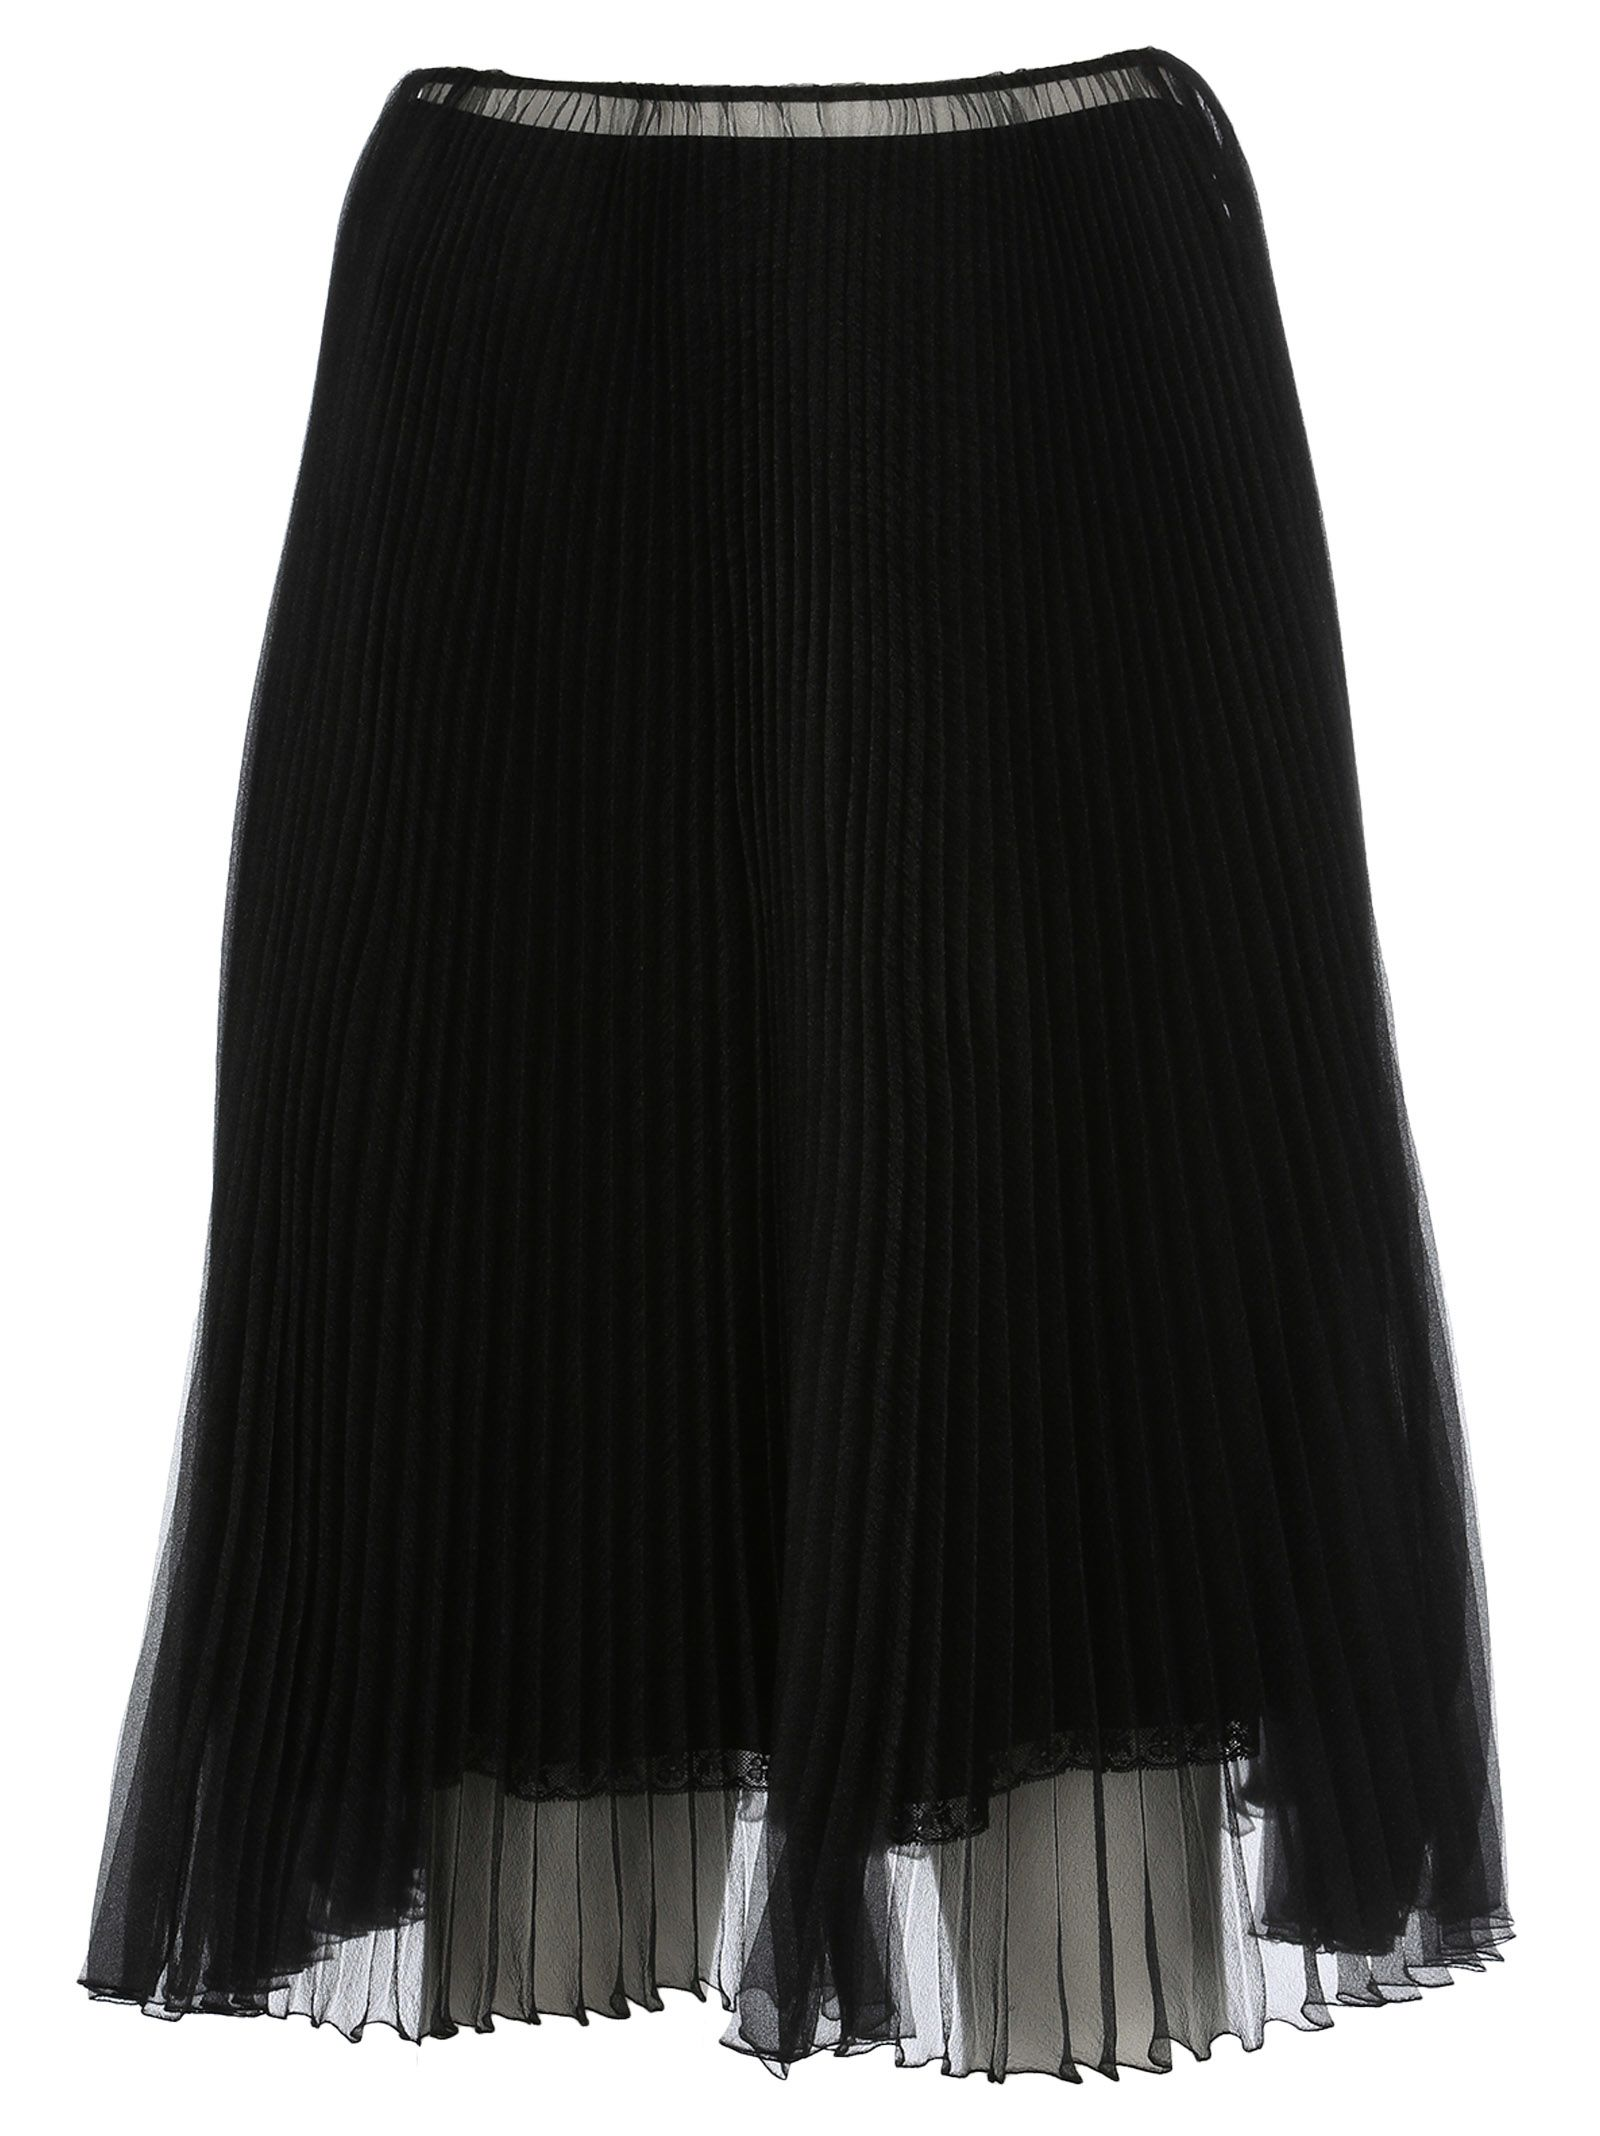 Prada Organza Plissé A-line Skirt